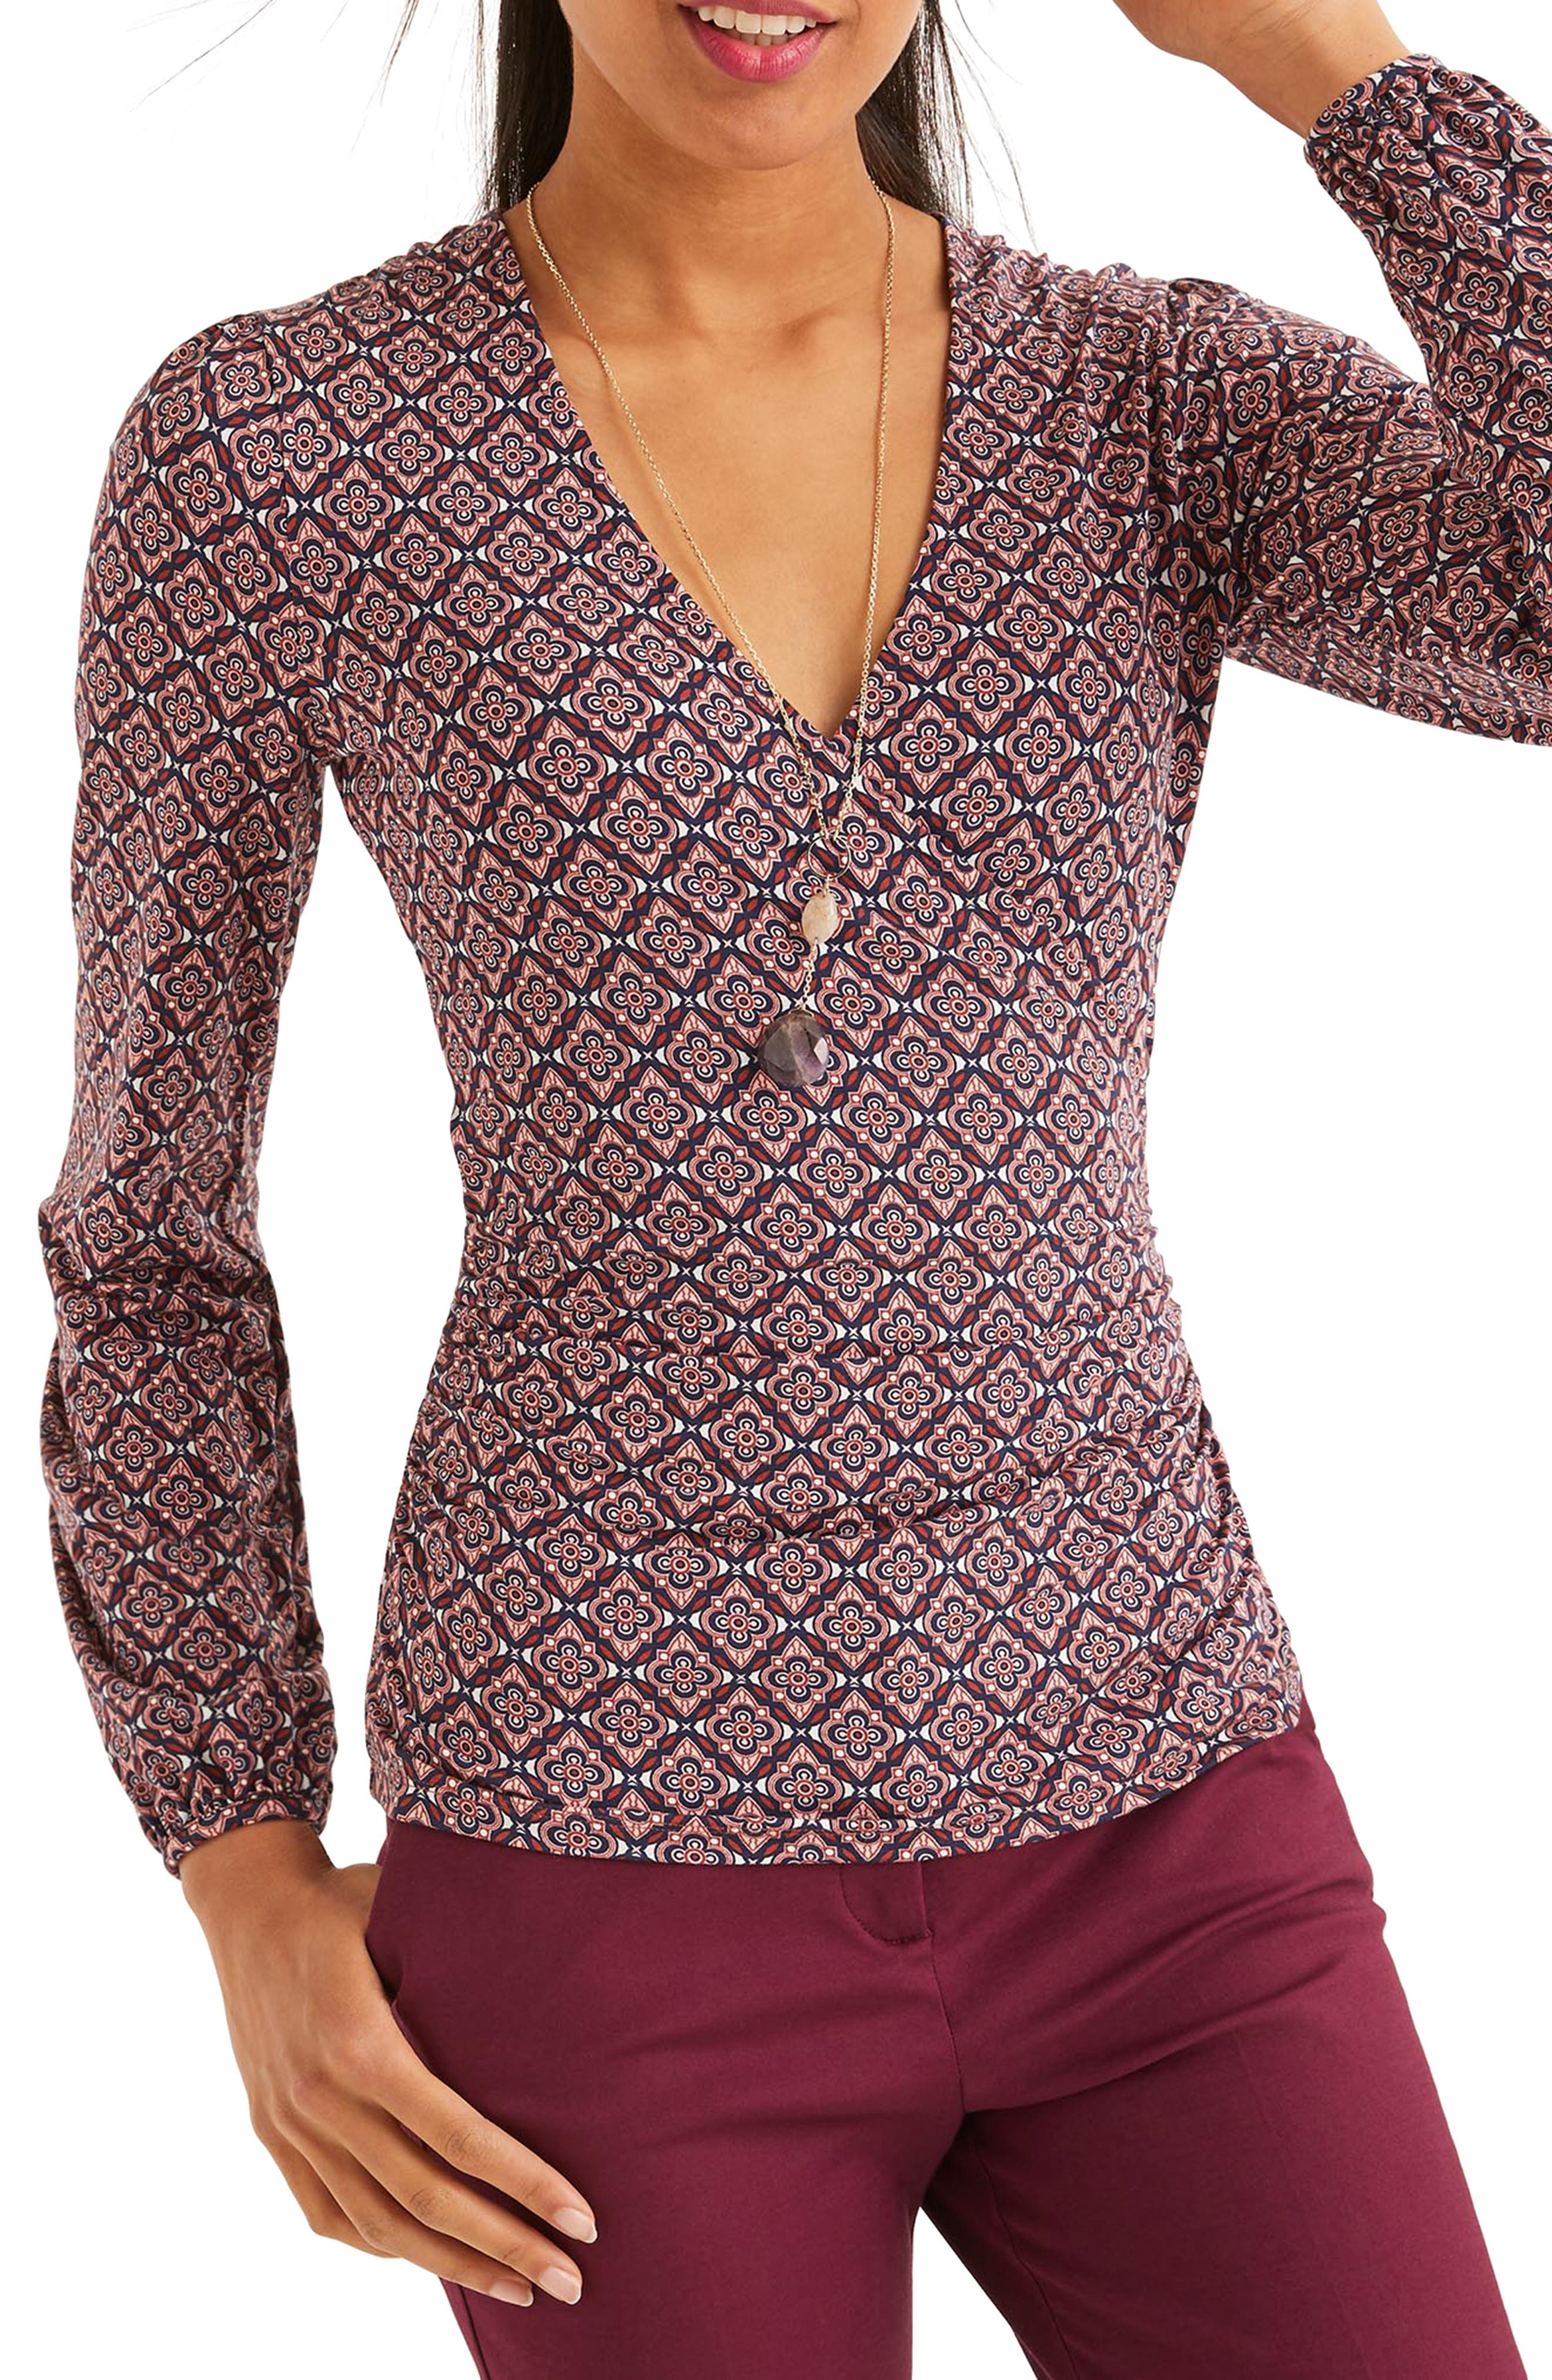 60s Shirts, T-shirt, Blouses, Hippie Shirts Womens Boden Elodie Jersey Faux Wrap Top $70.00 AT vintagedancer.com